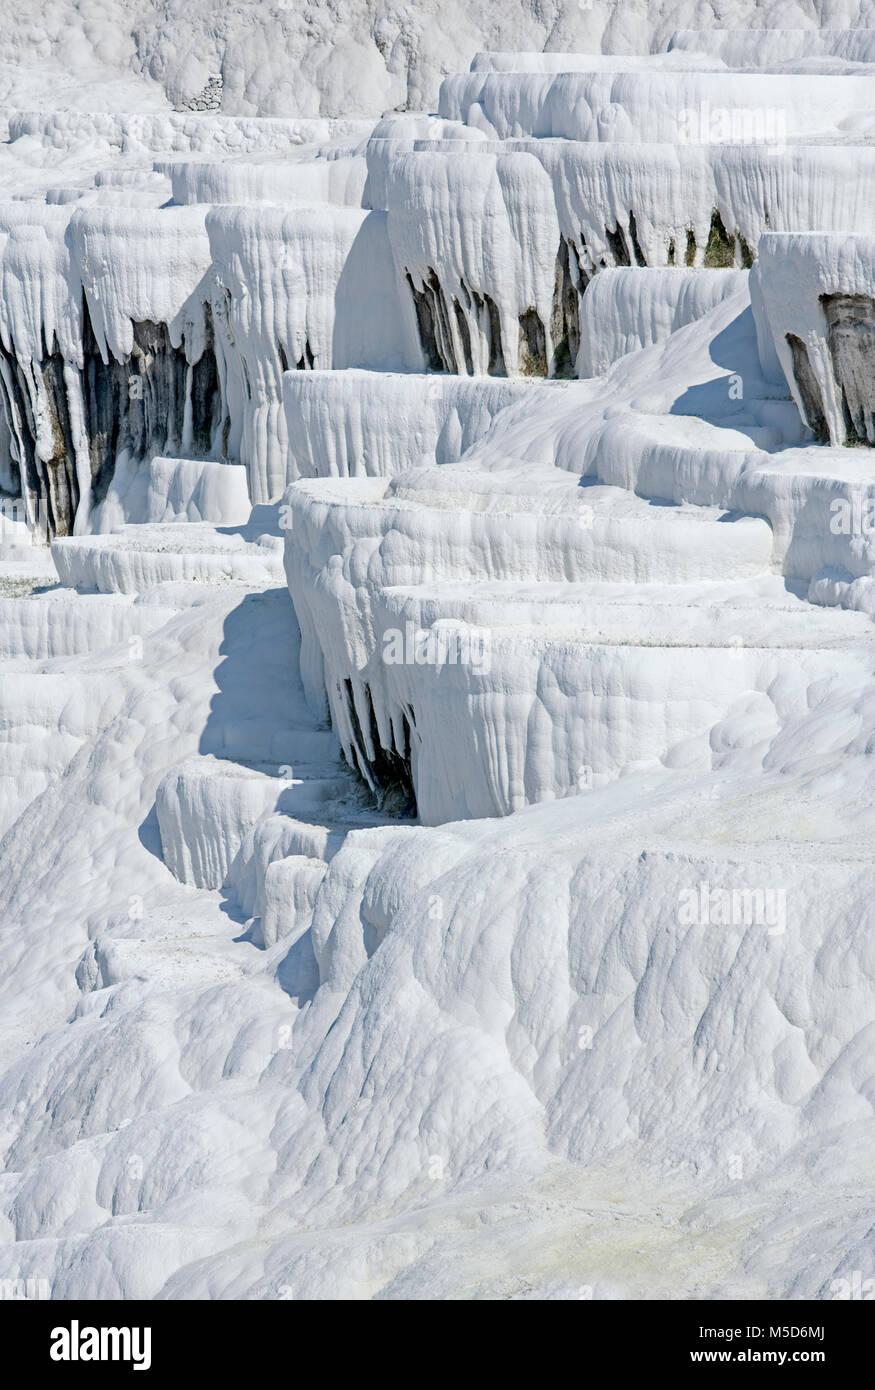 White travertine limestone rock formations known as the cotton castle, Pamukkale, Denizli, Anatolia, Turkey, Asia - Stock Image